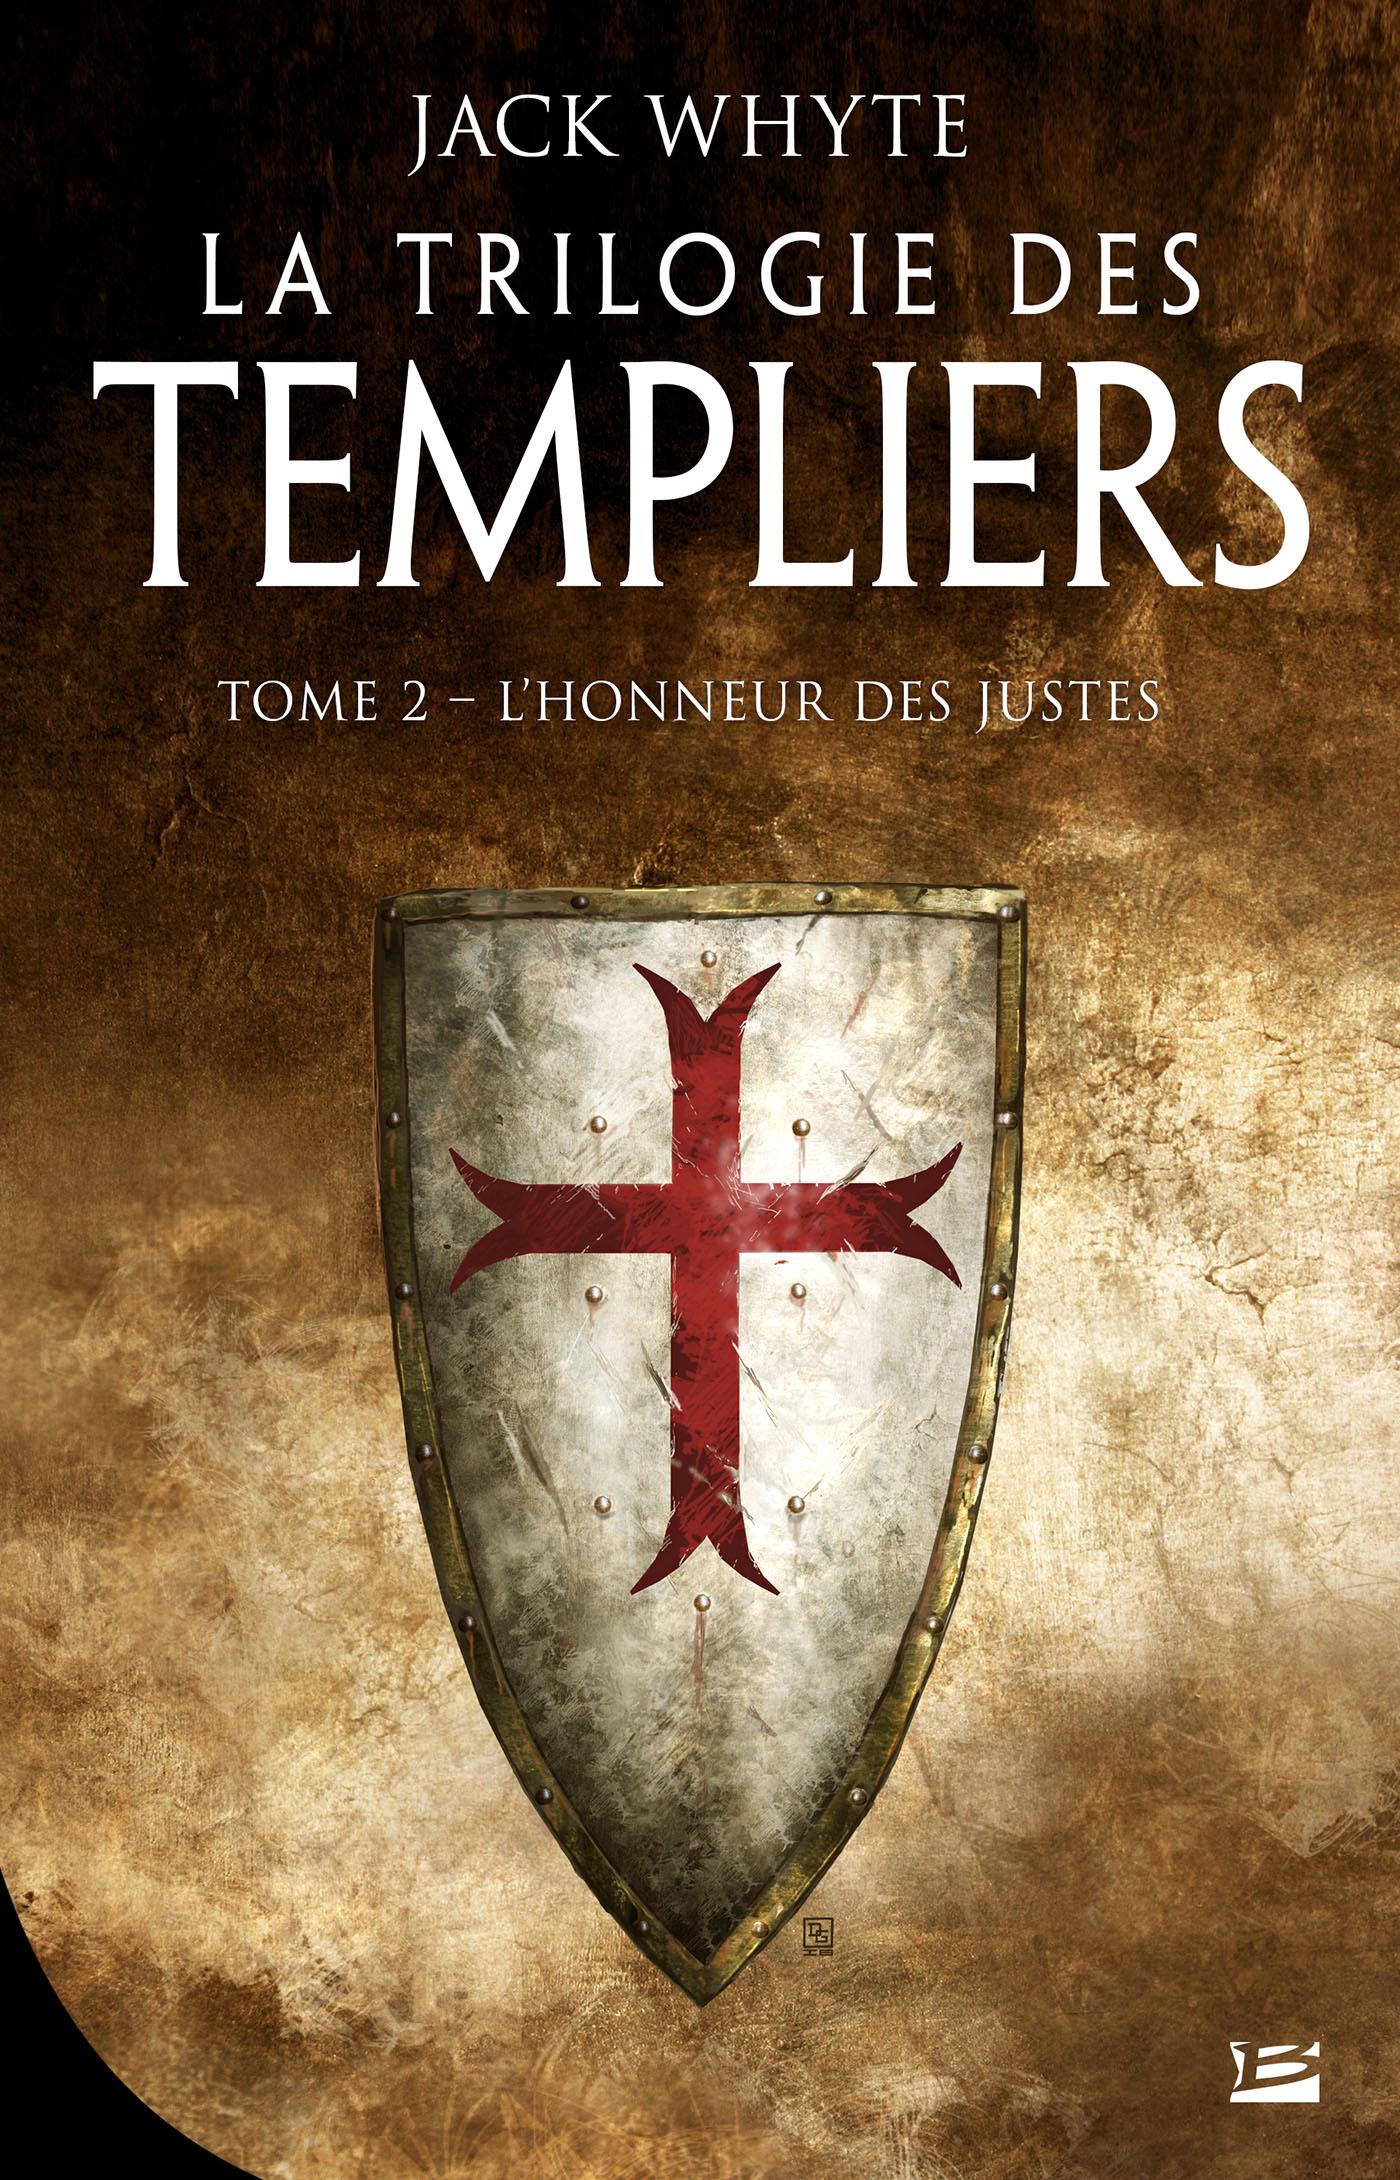 cdn1.booknode.com/book_cover/1071/full/la-trilogie-des-templiers-tome-2-l-honneur-des-justes-1070939.jpg